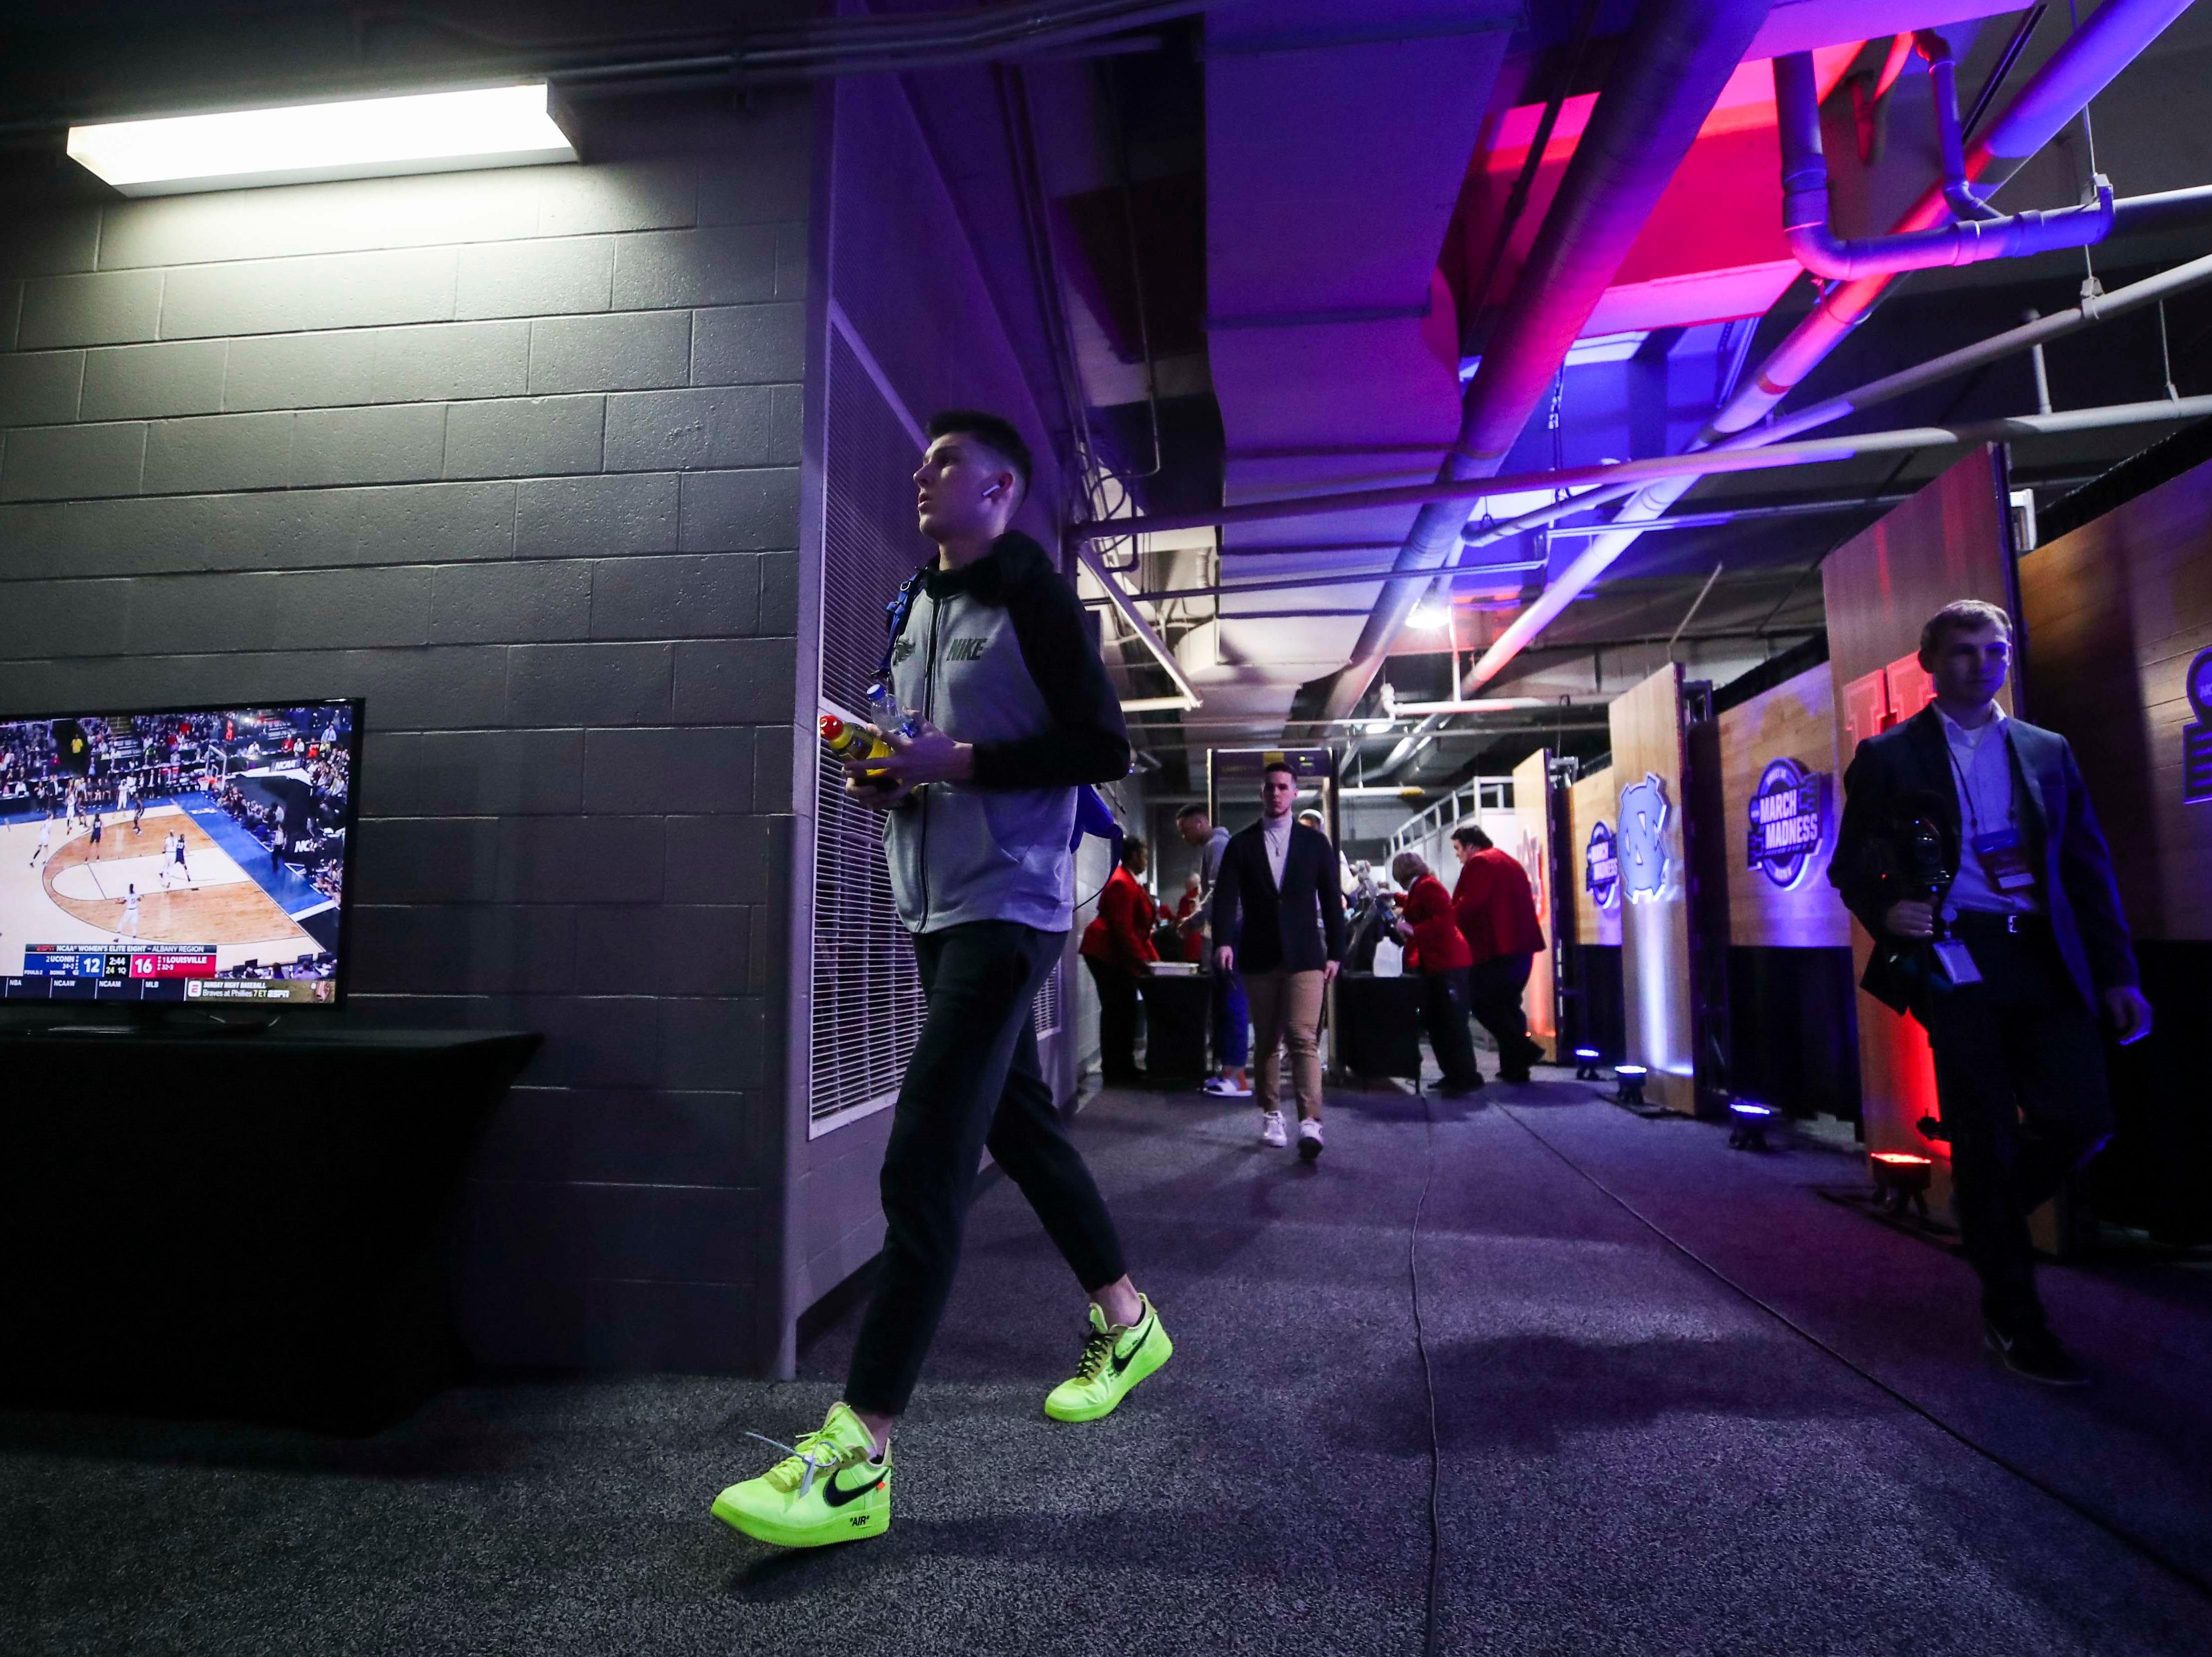 Kentucky player Tyler Herro walks towards the locker room at the Sprint Center in Kansas City before game against Auburn. March 31, 2019